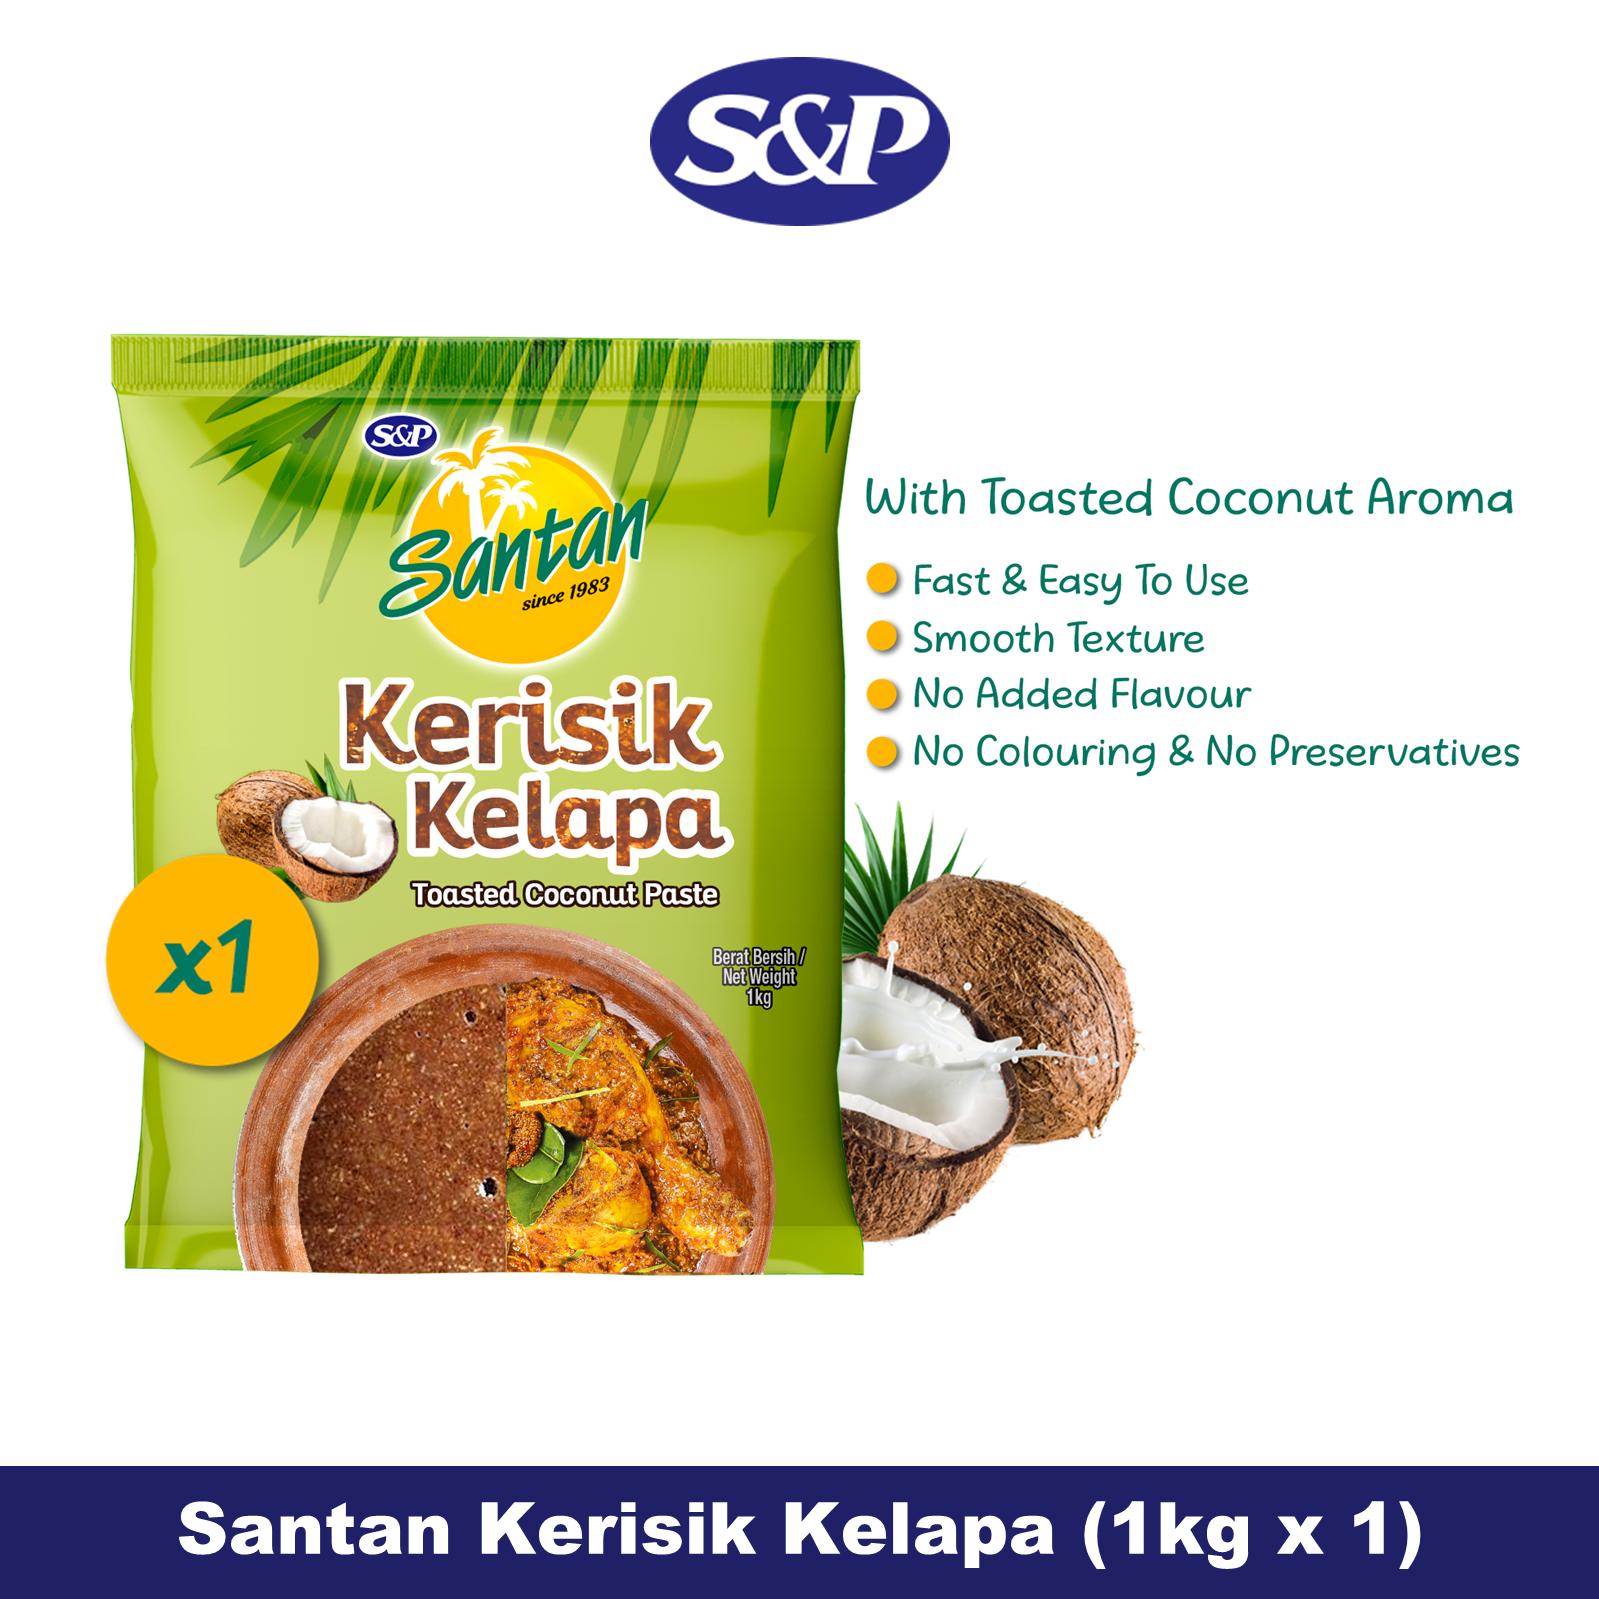 S&P Santan Coconut Paste Kerisik Kelapa (1kg x1)